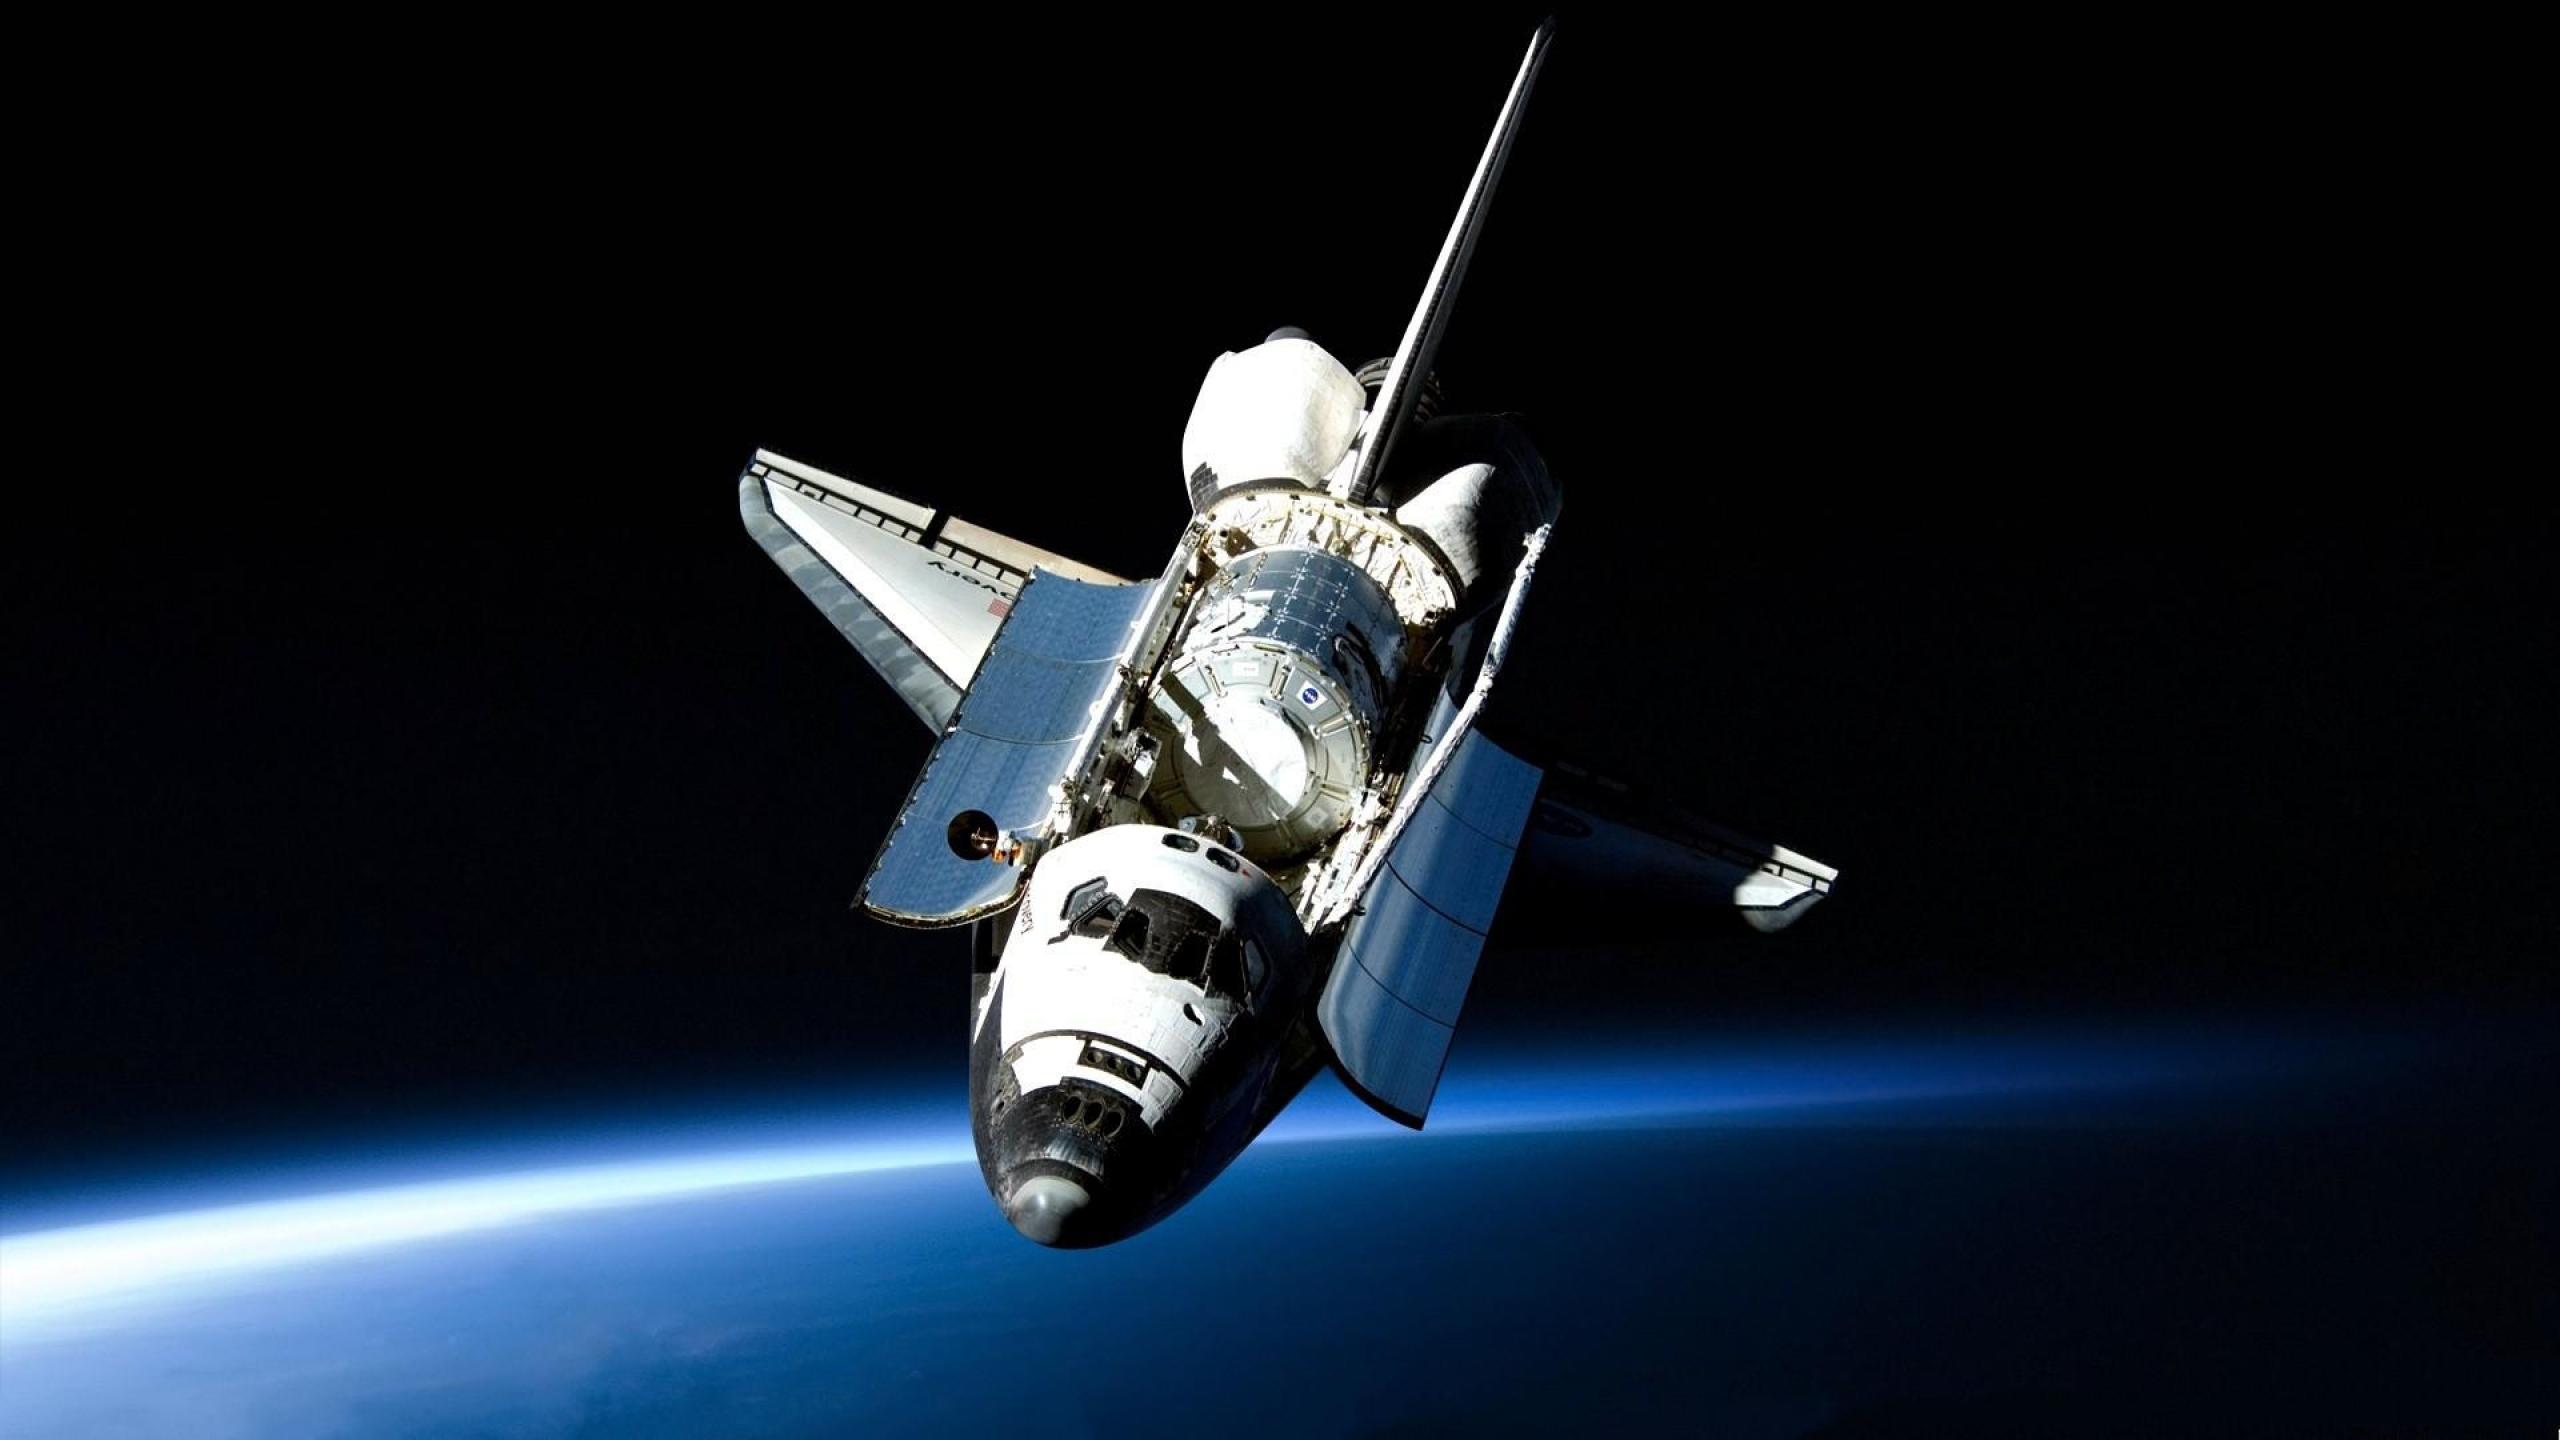 Download Wallpaper 2560x1440 shuttle, open space, flight, light Mac ...